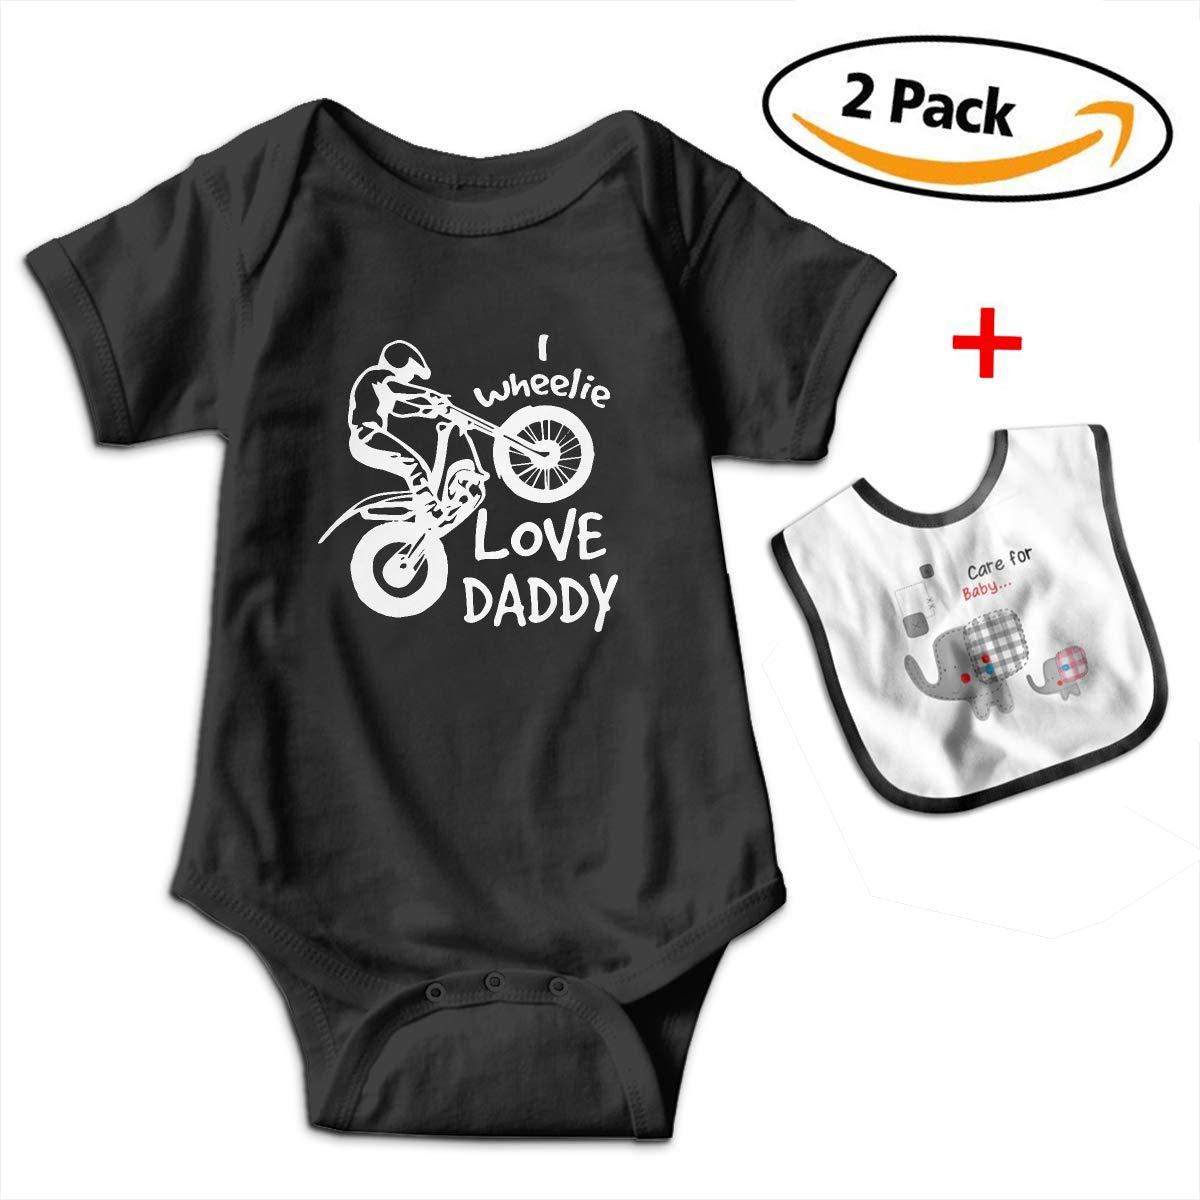 Robprint I Wheelie Love Daddy Baby Boys' Girls' Essentials Short-Sleeve Onesies Rompers